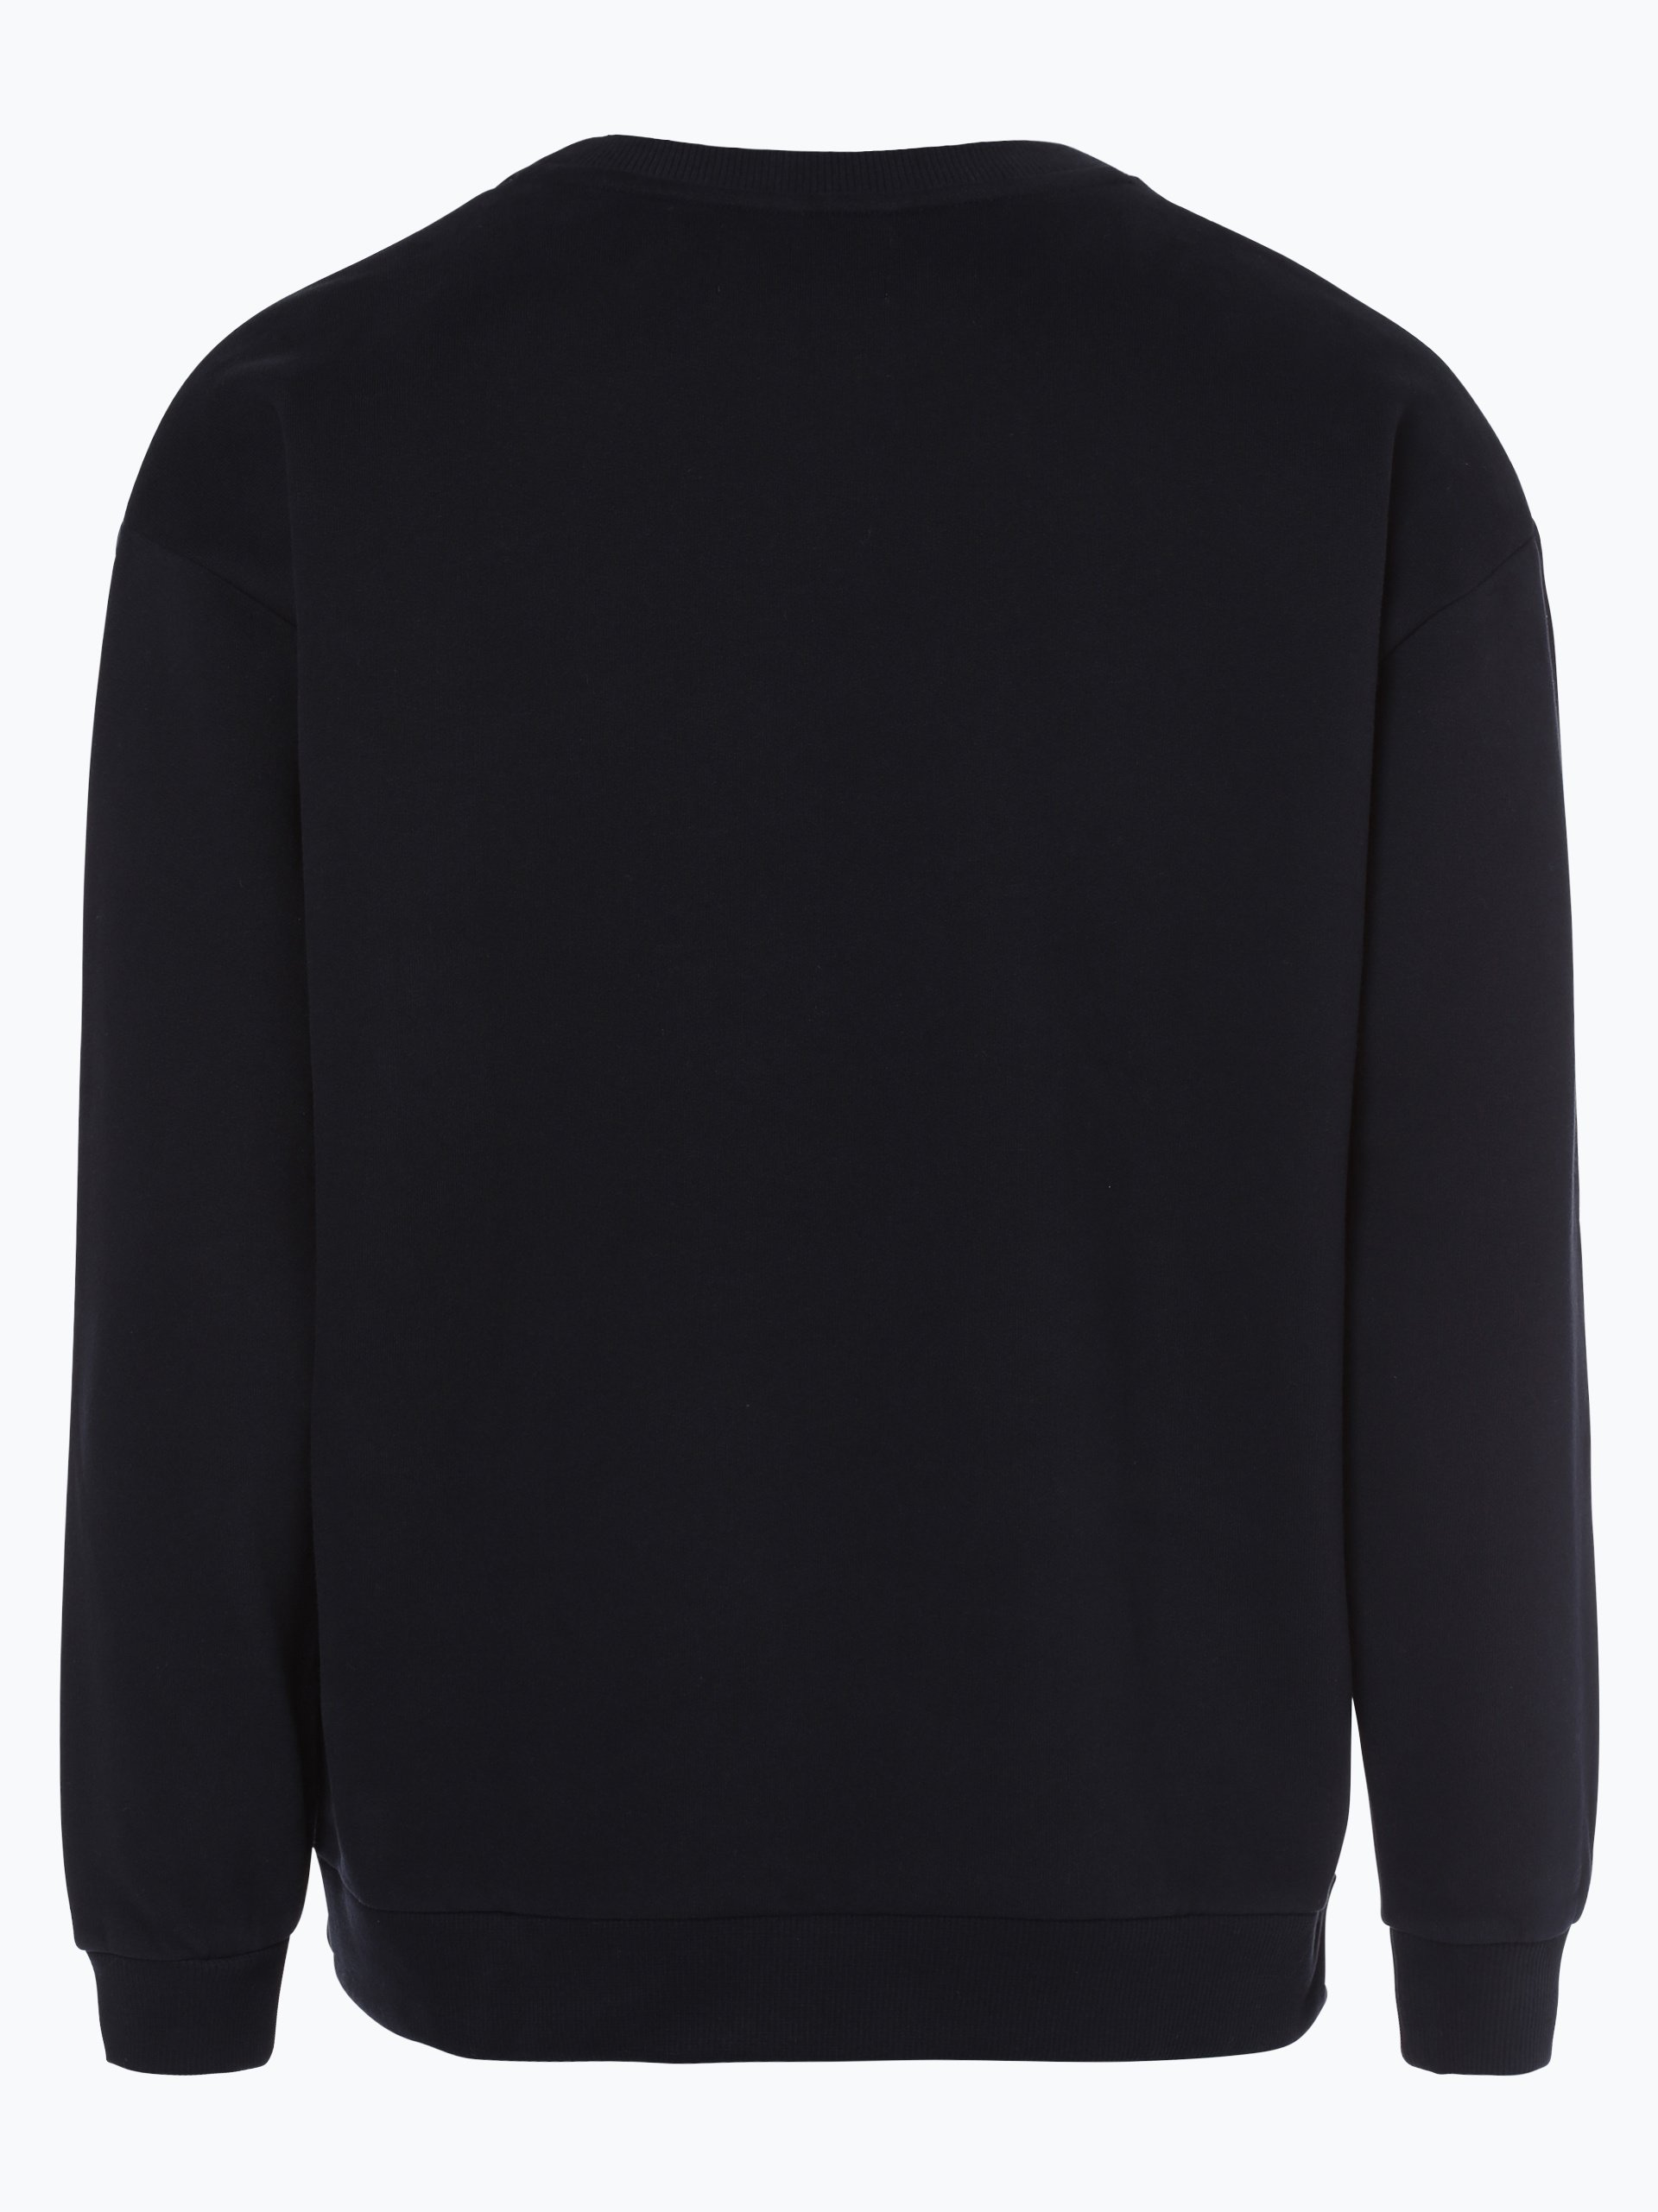 calvin klein jeans herren sweatshirt schwarz bedruckt online kaufen peek und cloppenburg de. Black Bedroom Furniture Sets. Home Design Ideas